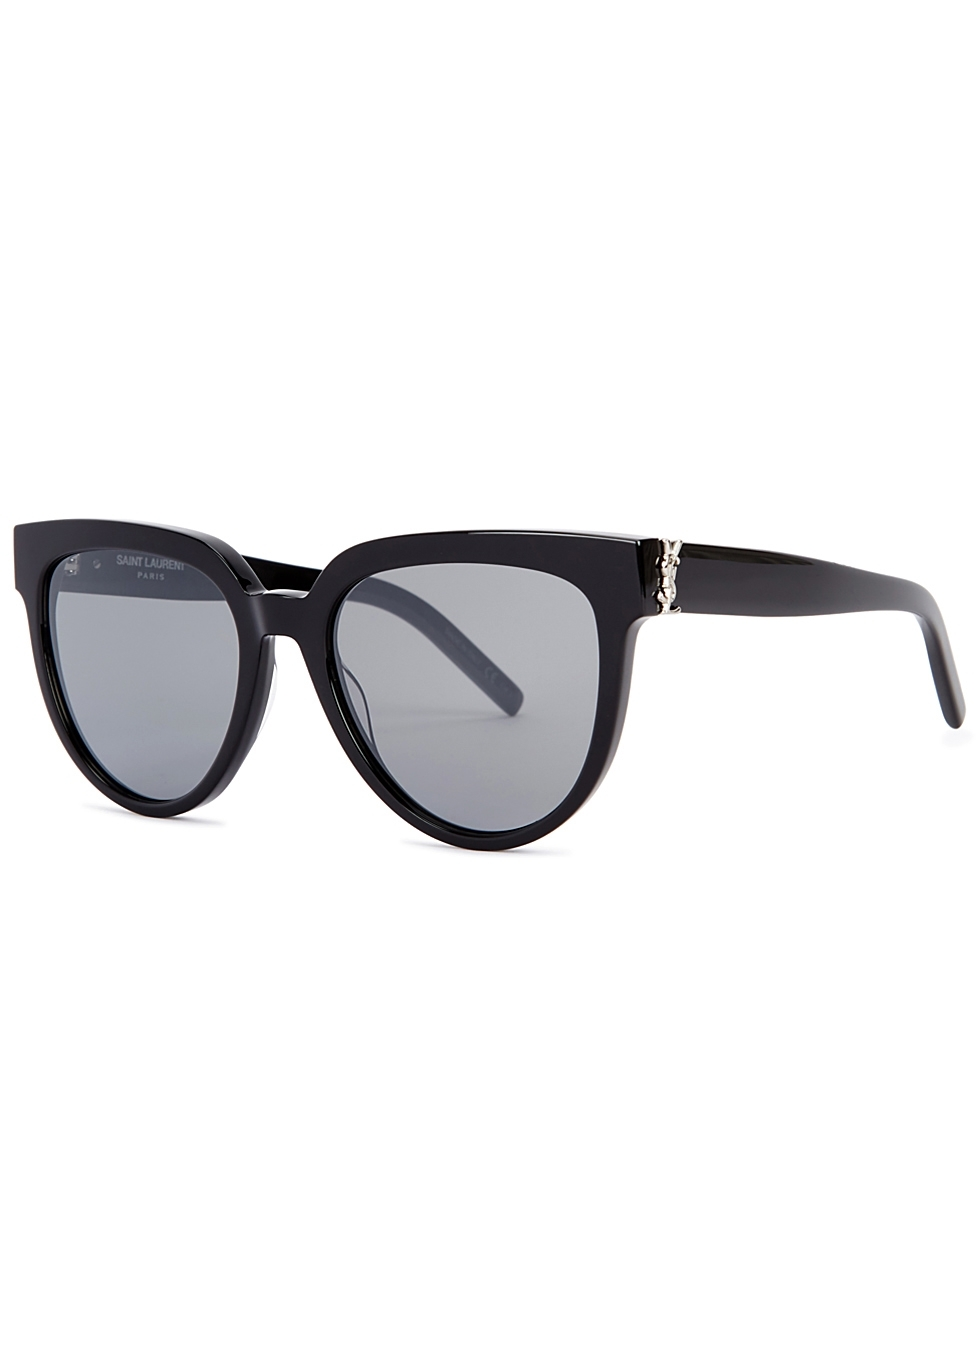 1eb892b3d5 Women s Designer Wayfarer Sunglasses - Harvey Nichols